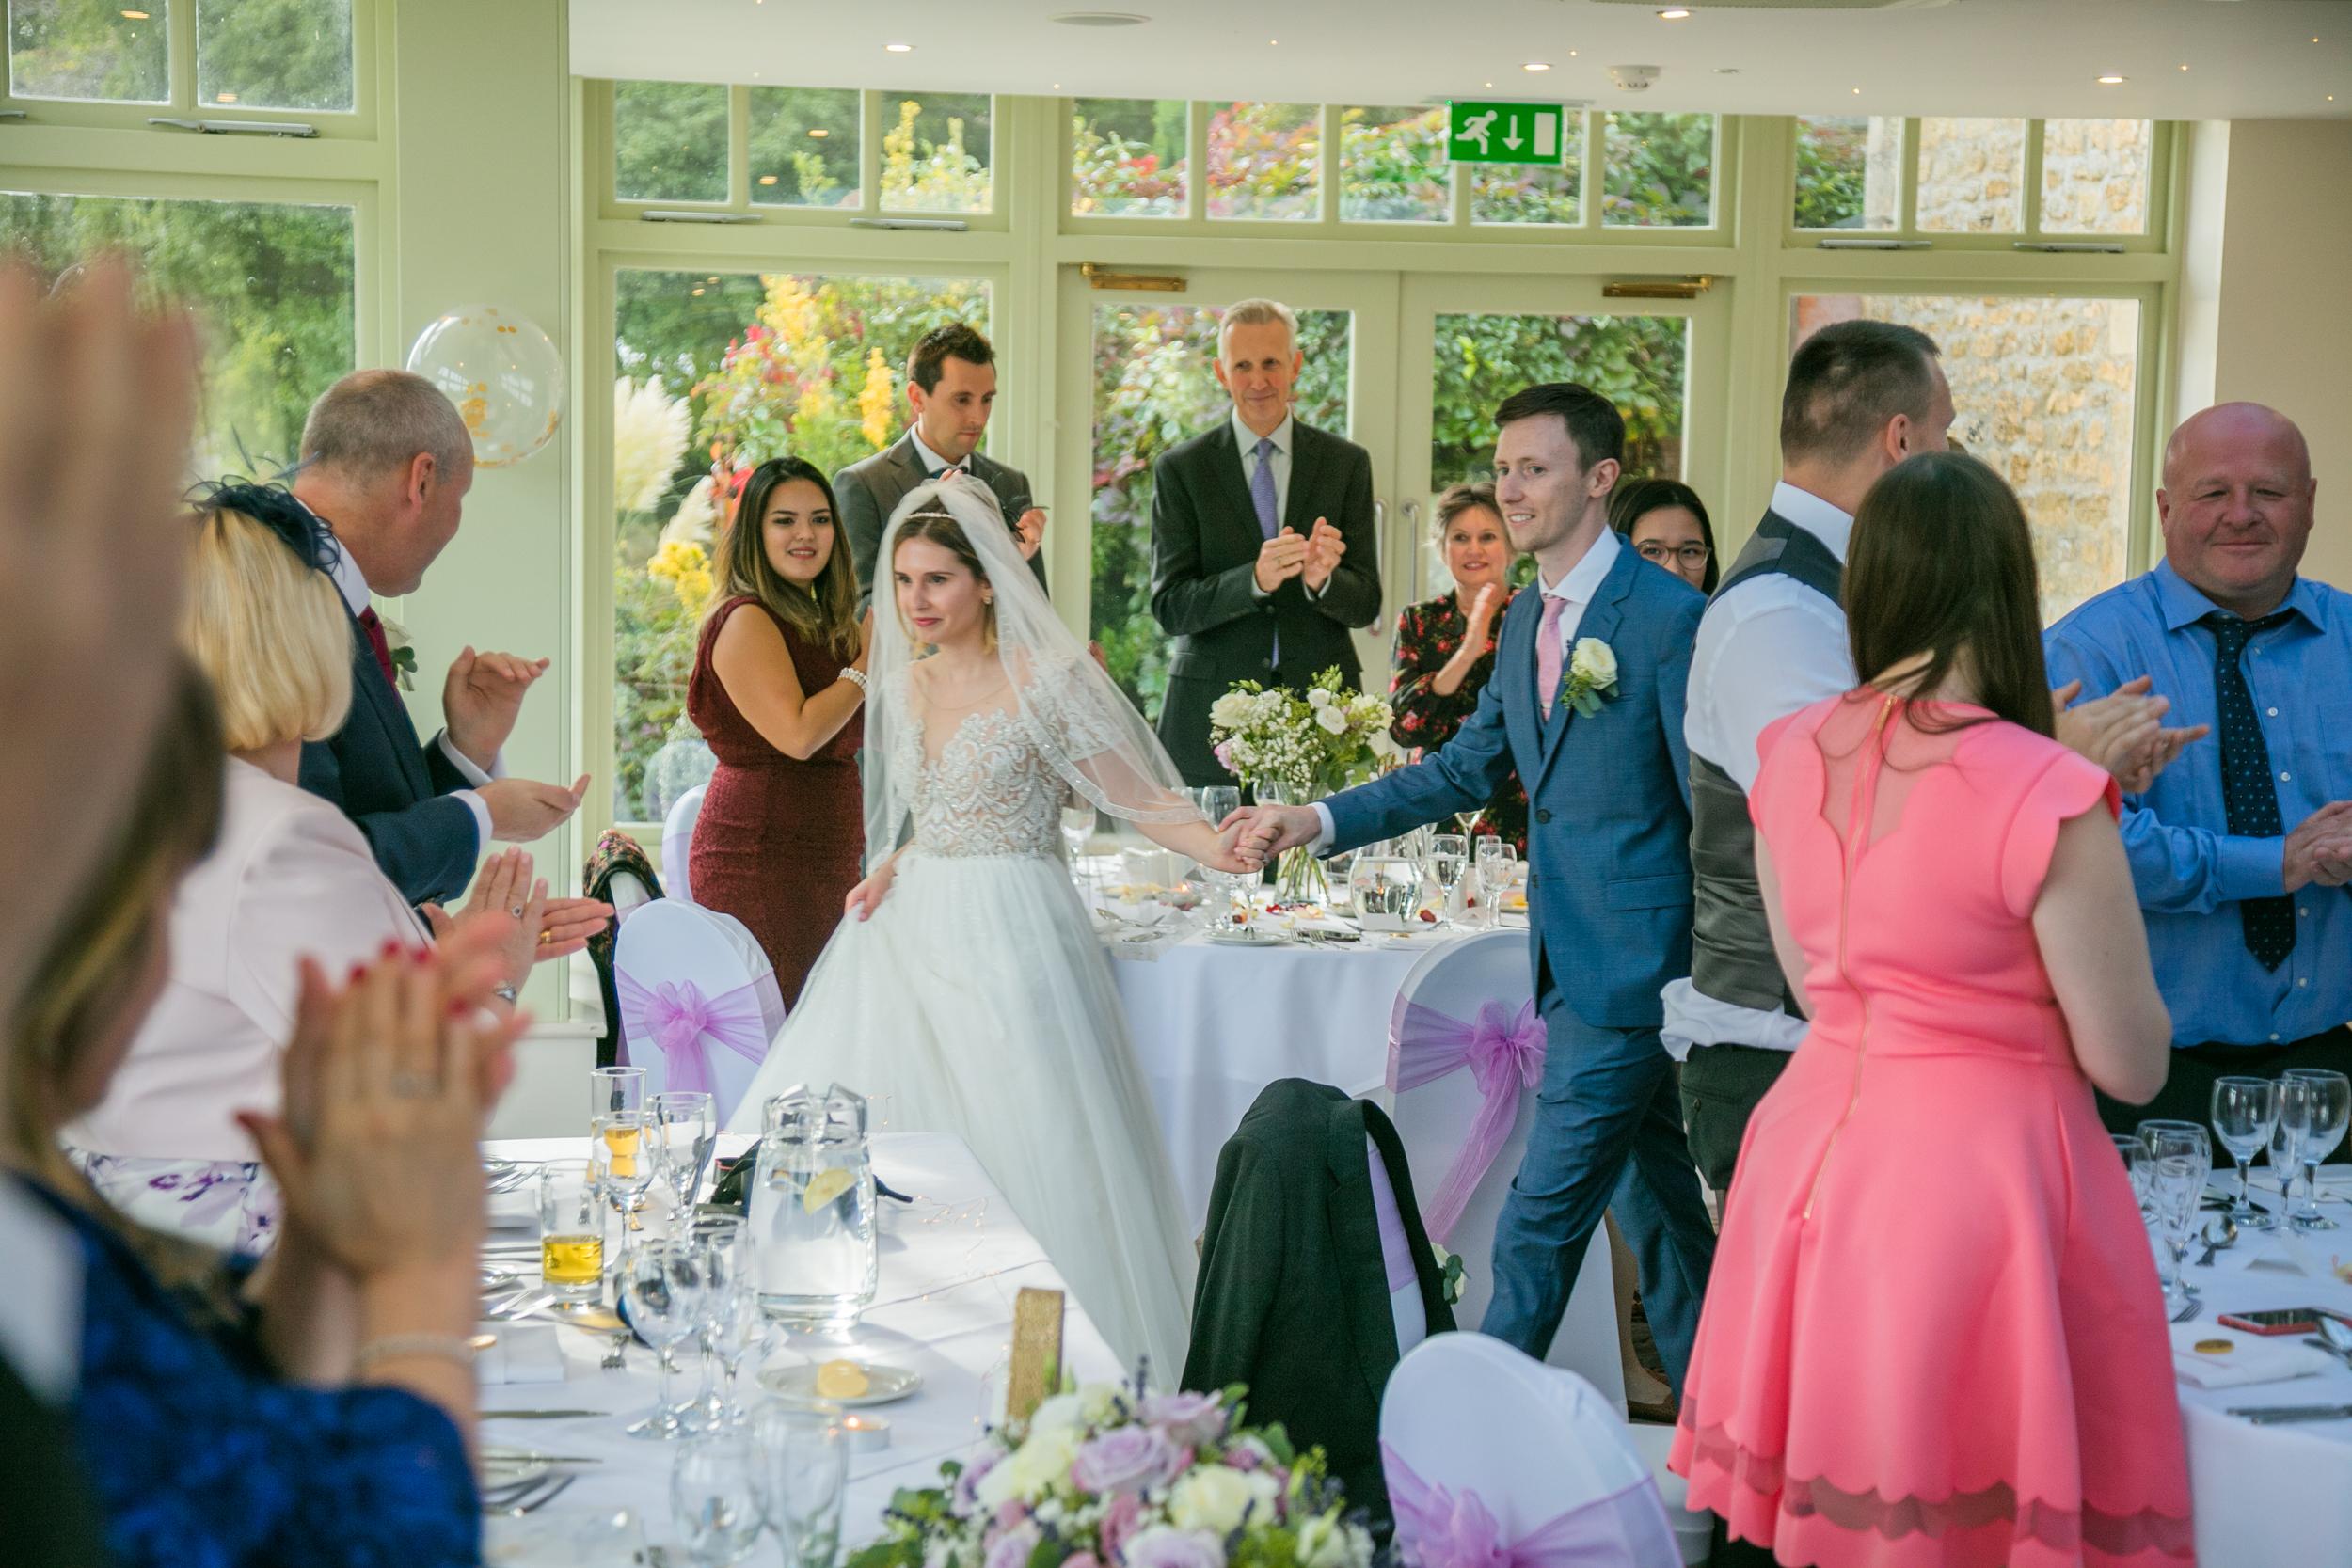 Charringworth-Manor-Wedding-Photography35.jpg